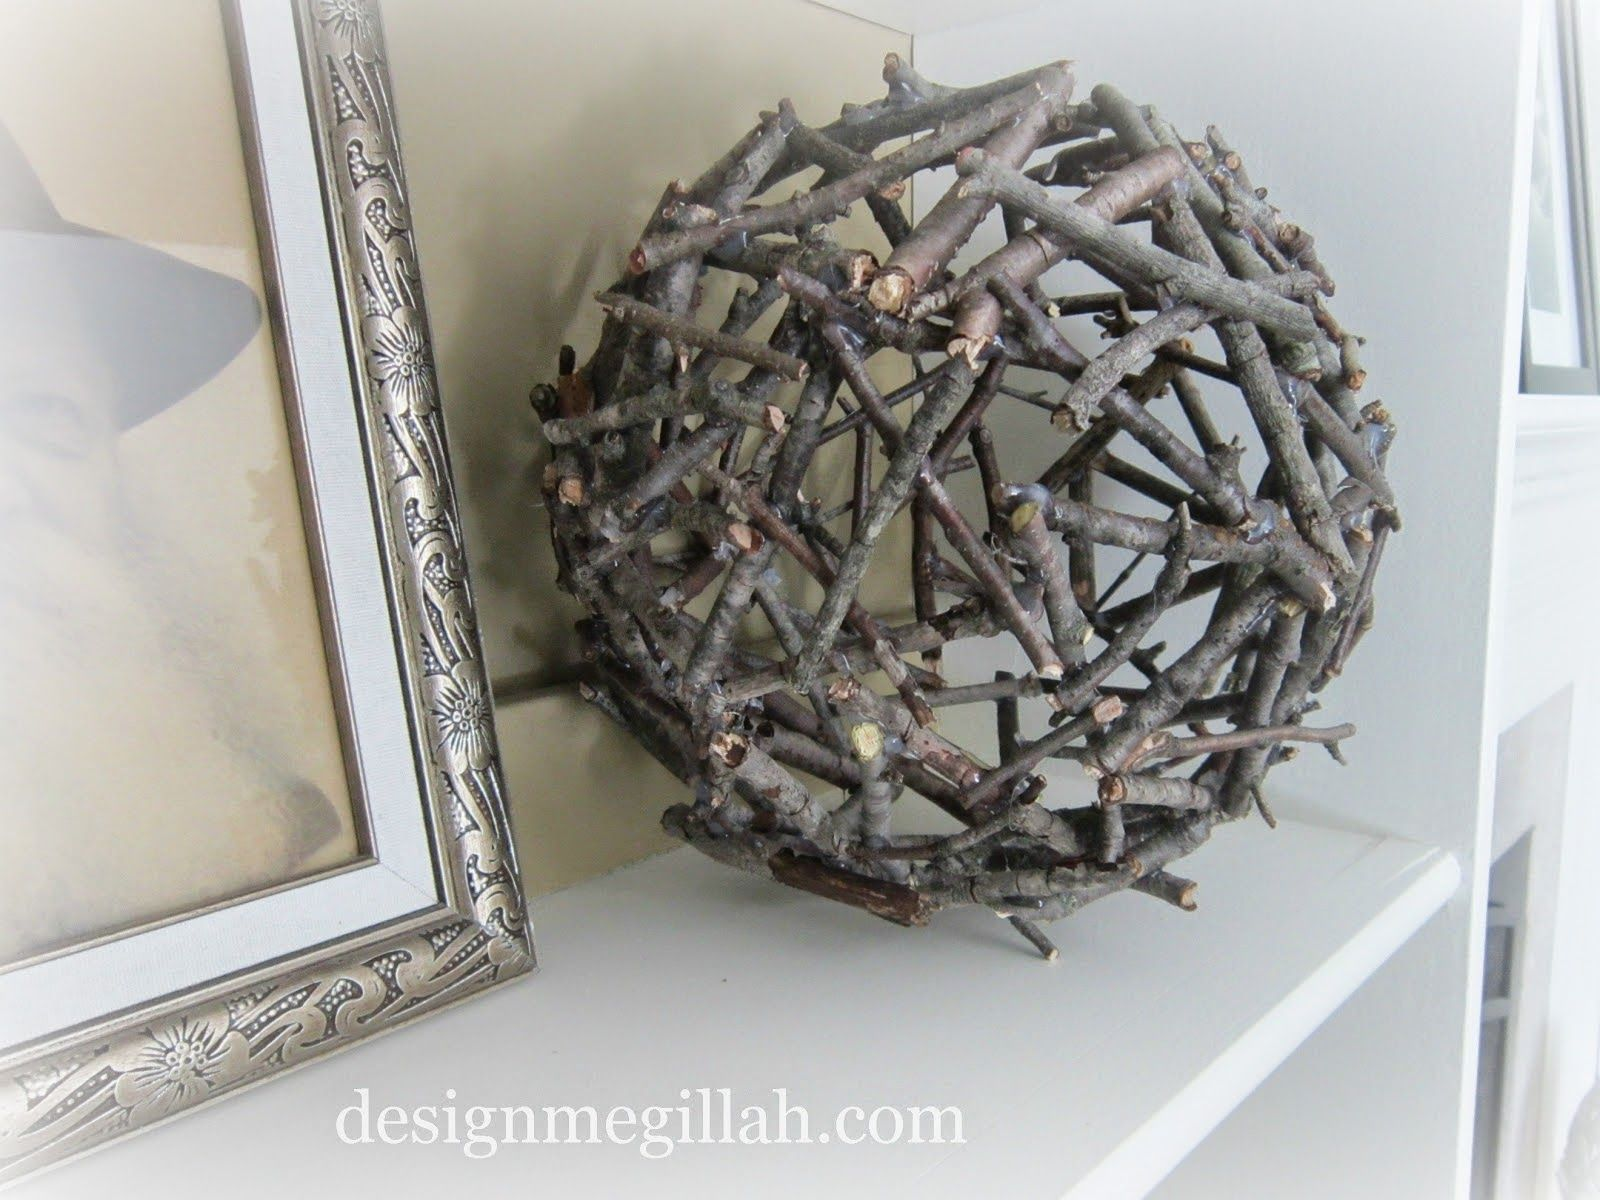 Making Decorative Ball Of Twigs Twig Crafts Twig Art Craft Stick Crafts